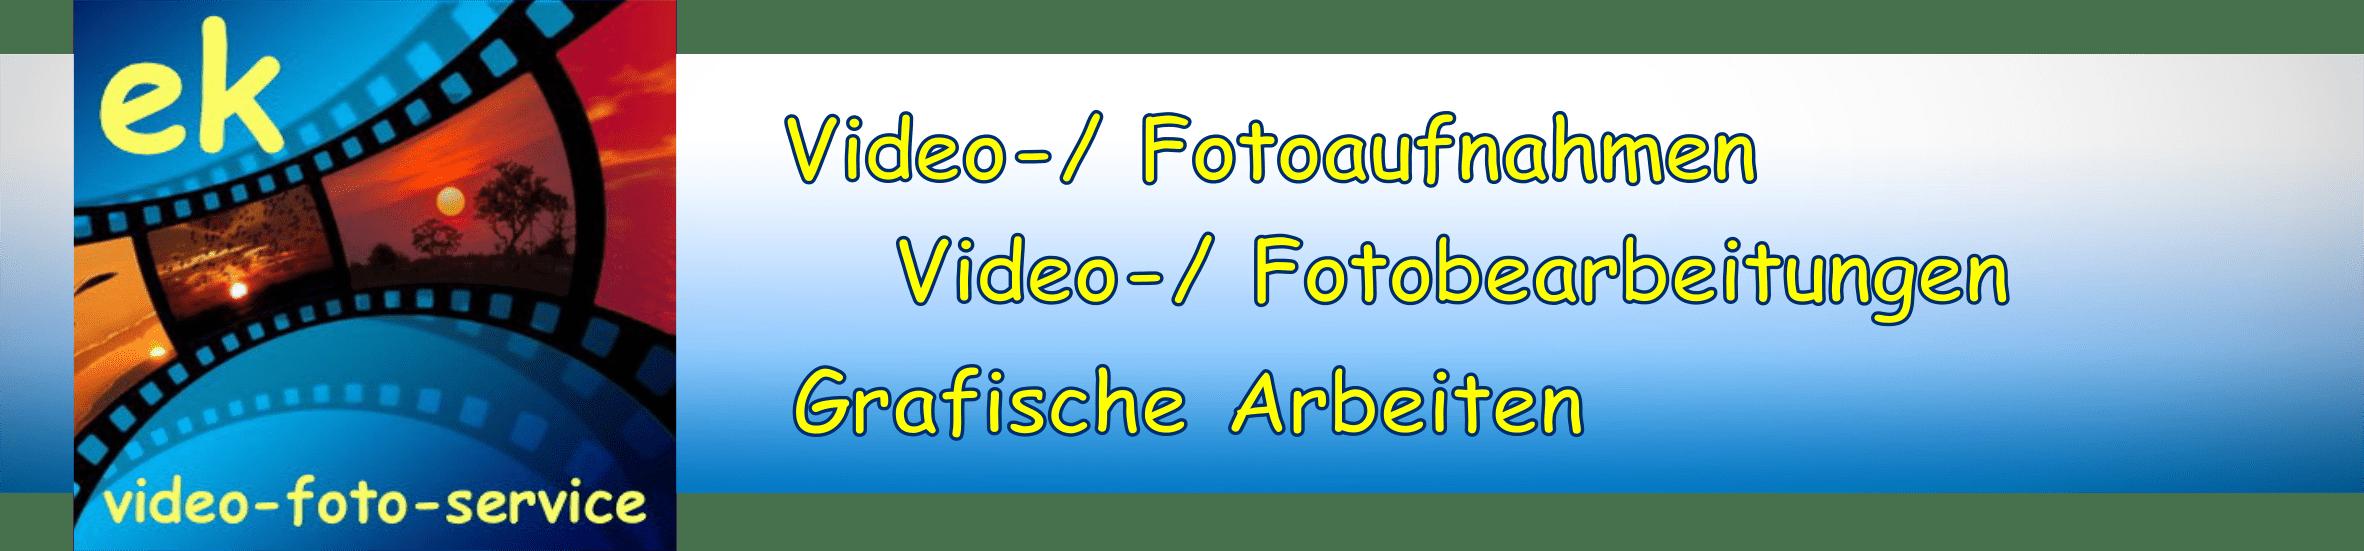 ek-video-foto-service